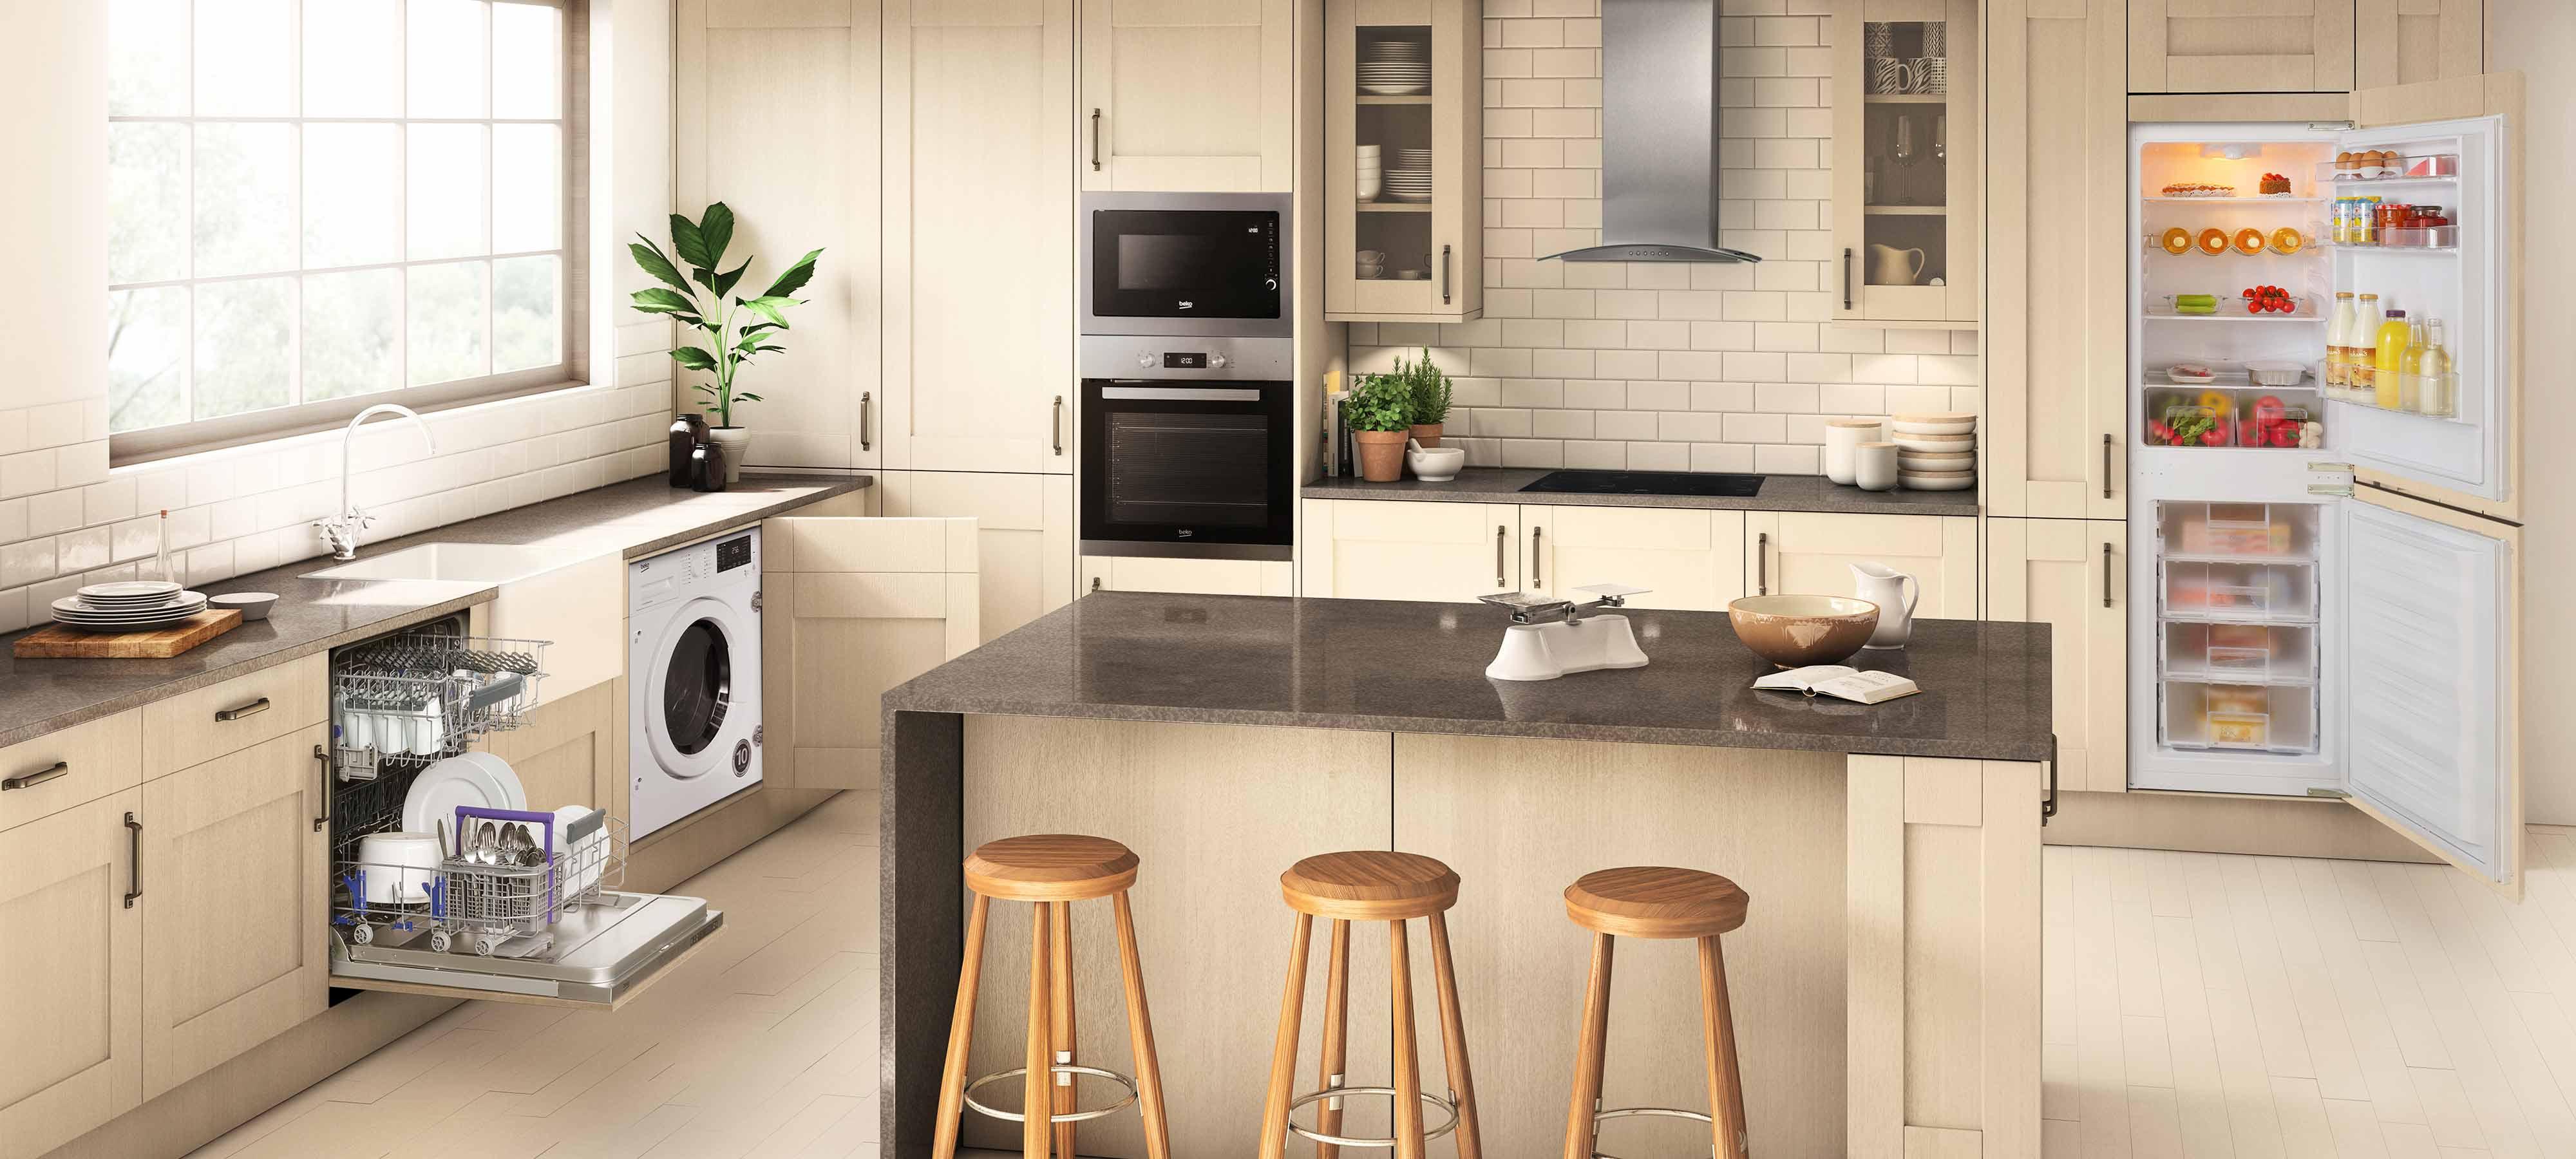 Latest Kitchen Cooking Appliances